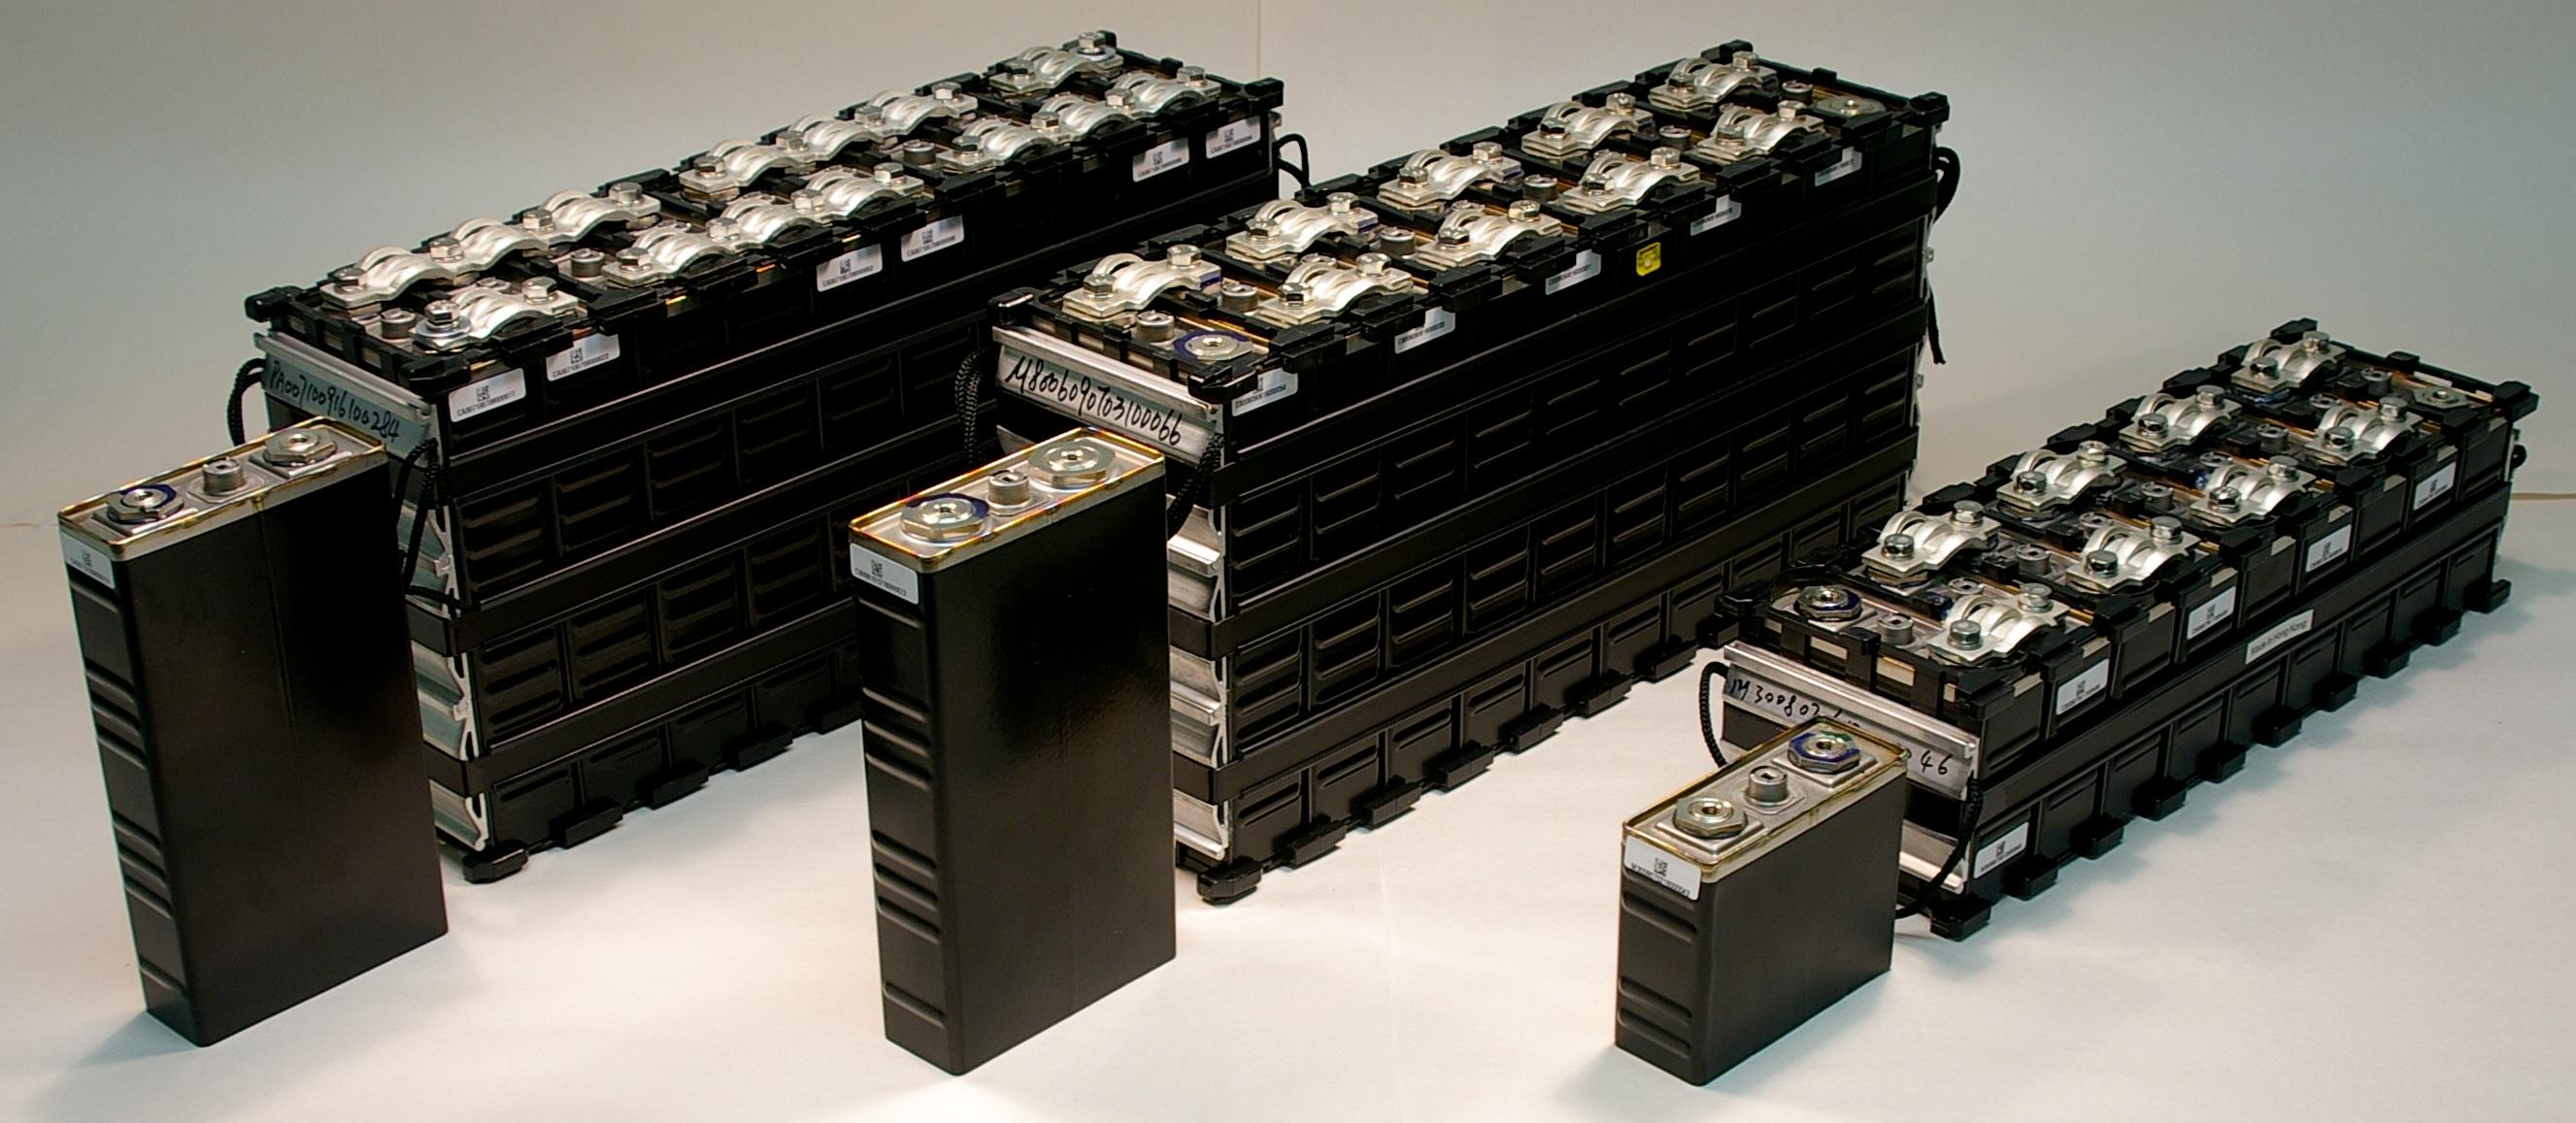 Marine Lithium propulsion battery